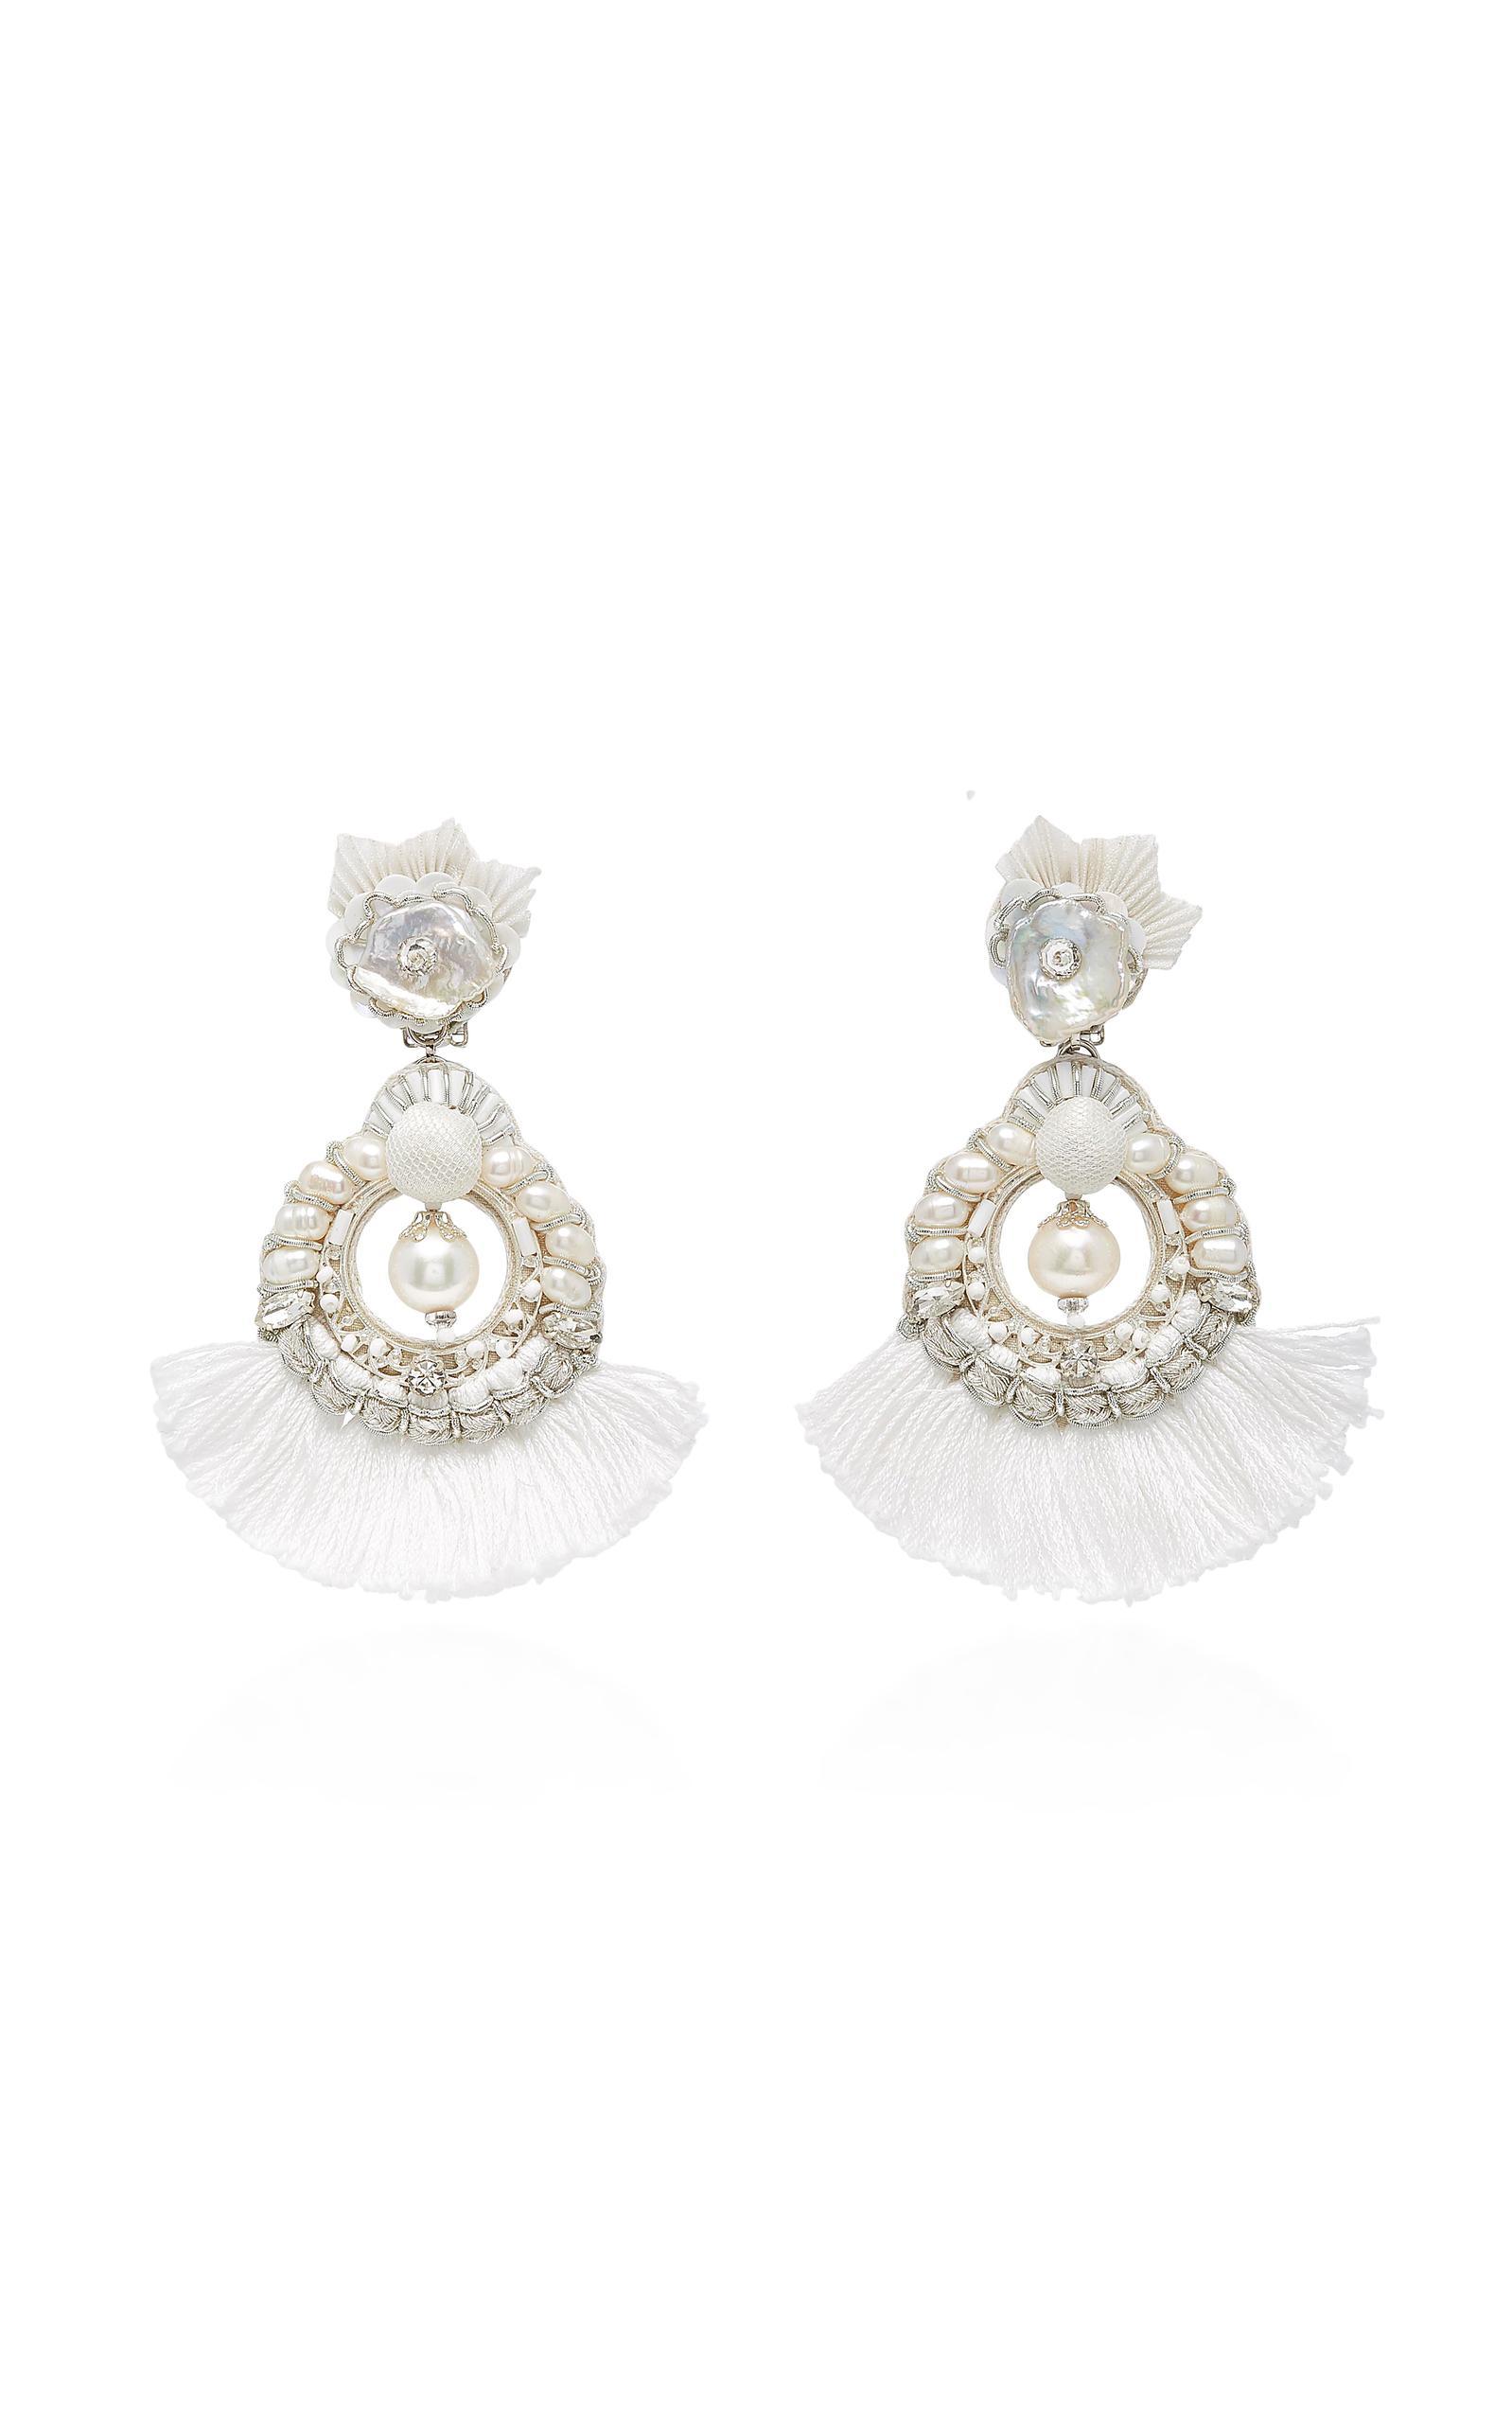 Ranjana Khan White And Blue Pearl Chandelier Earring